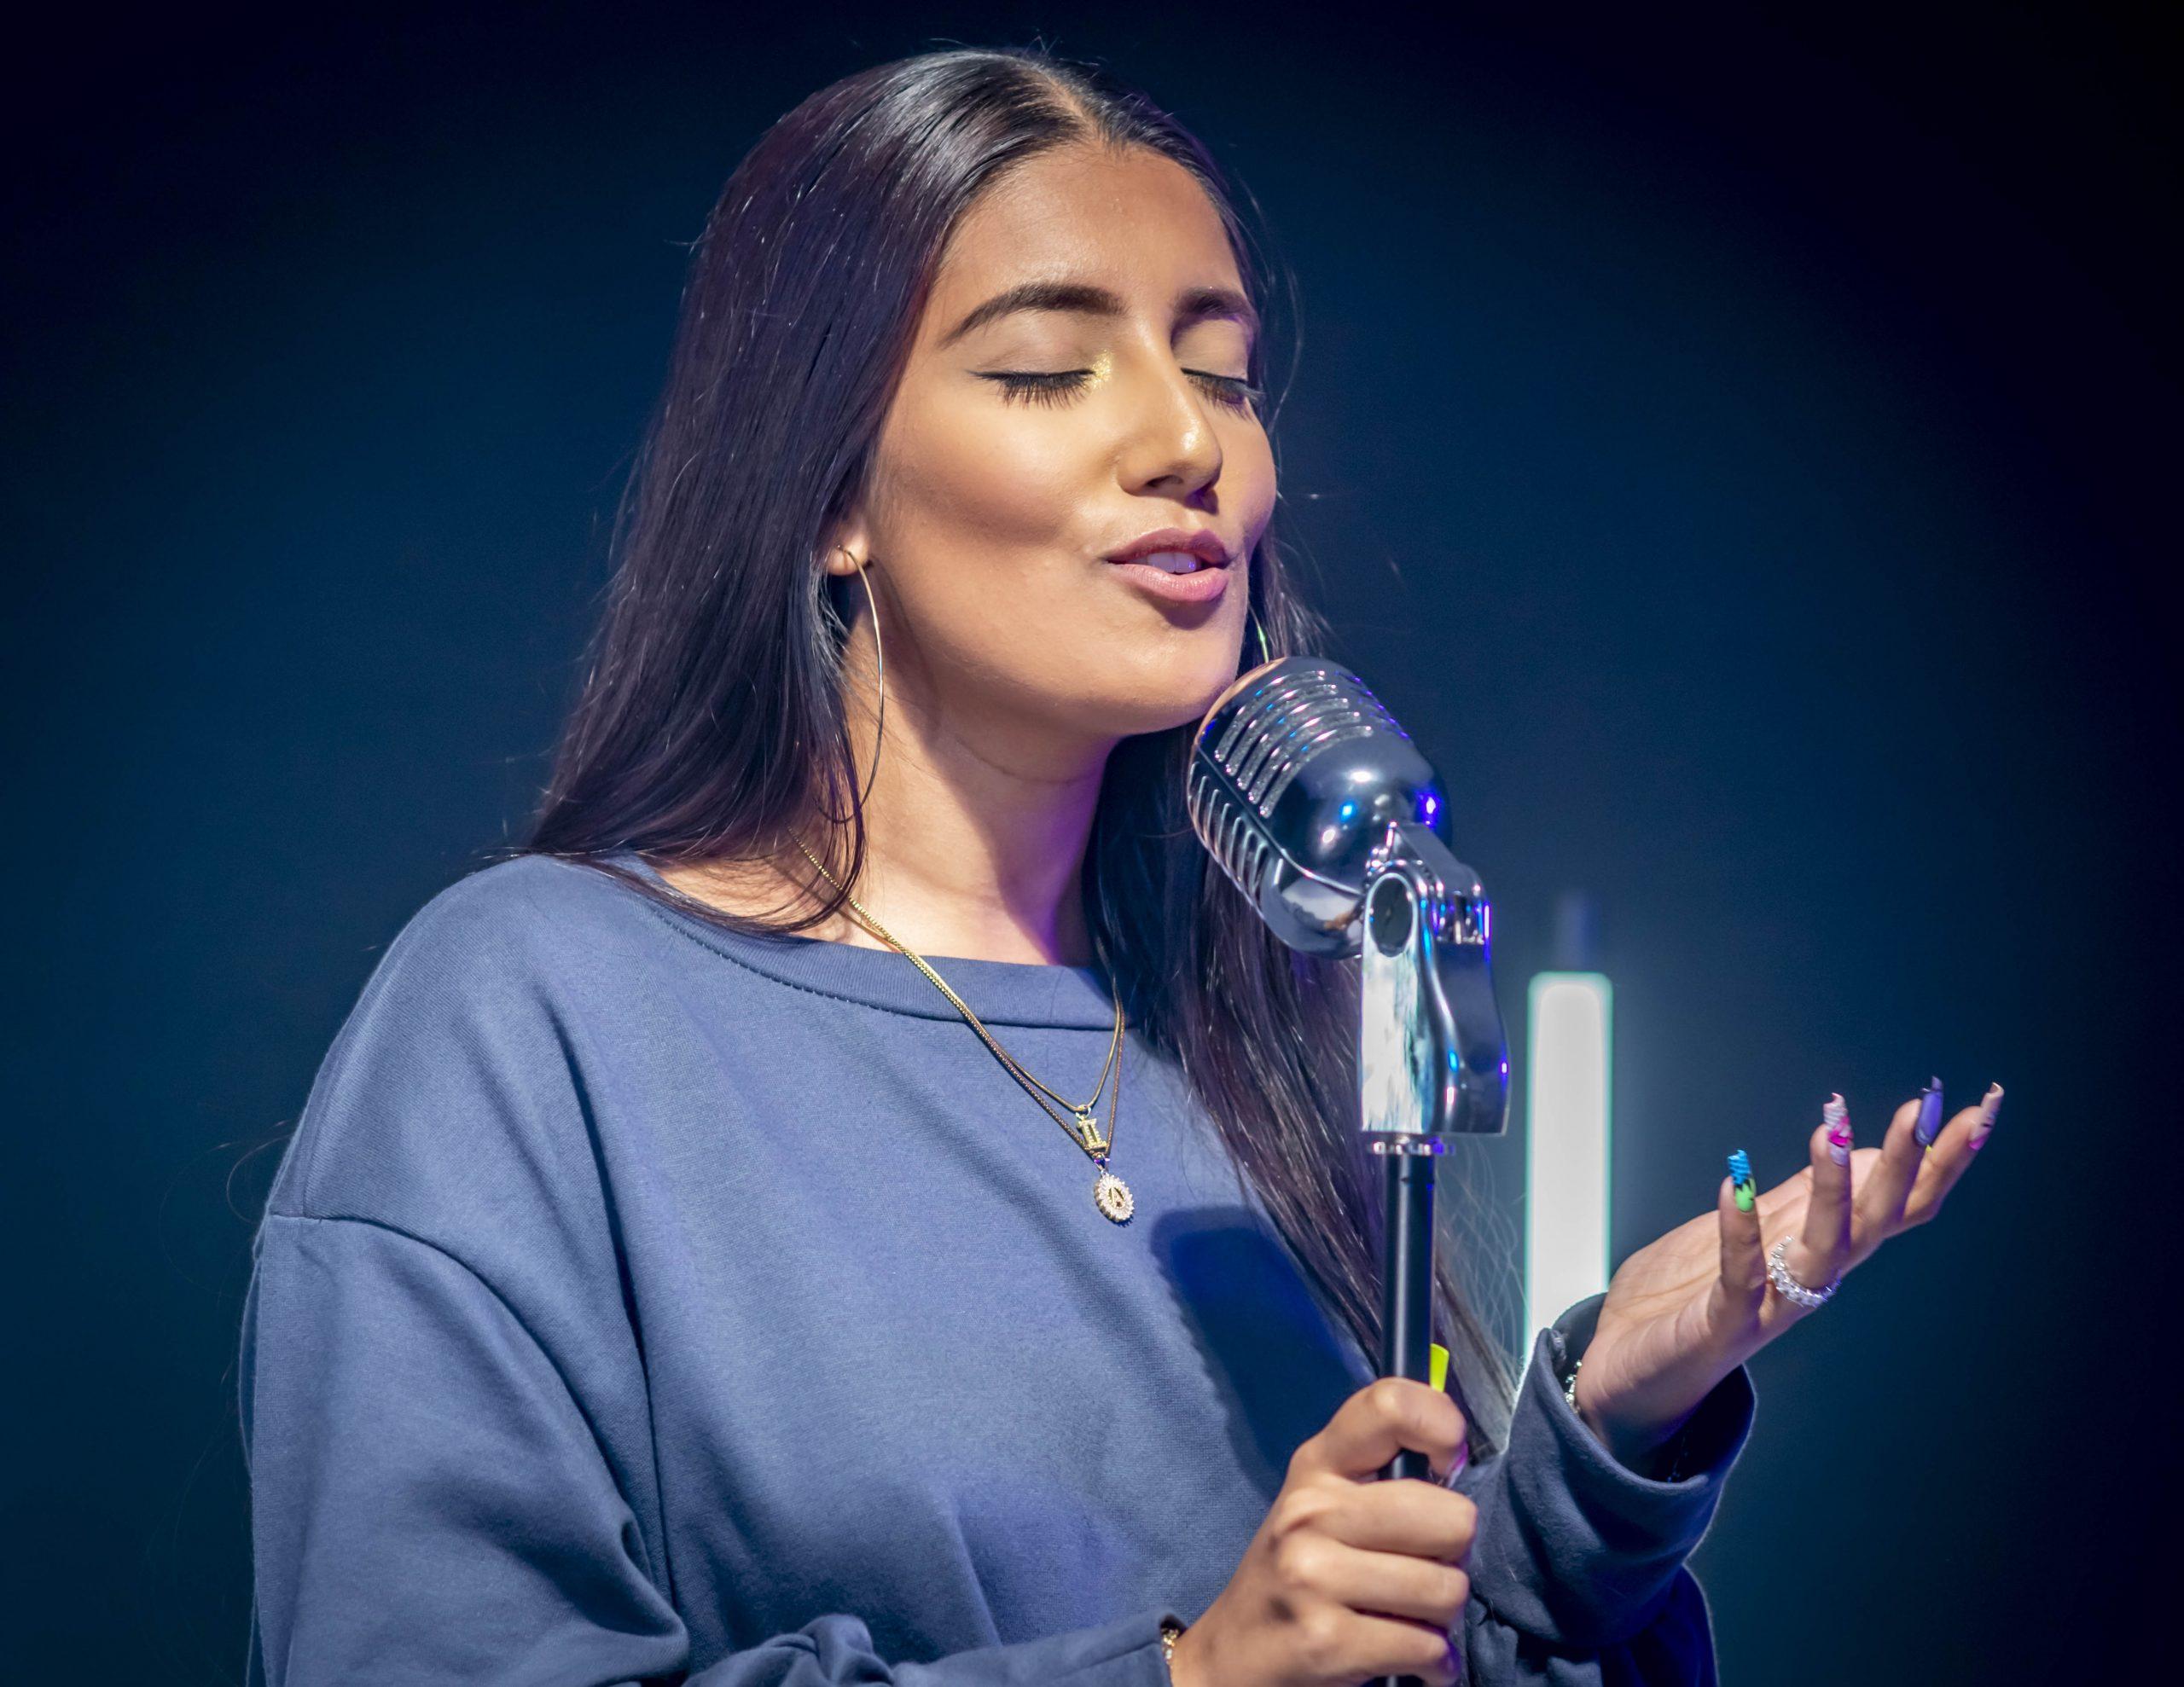 musician singer portrait